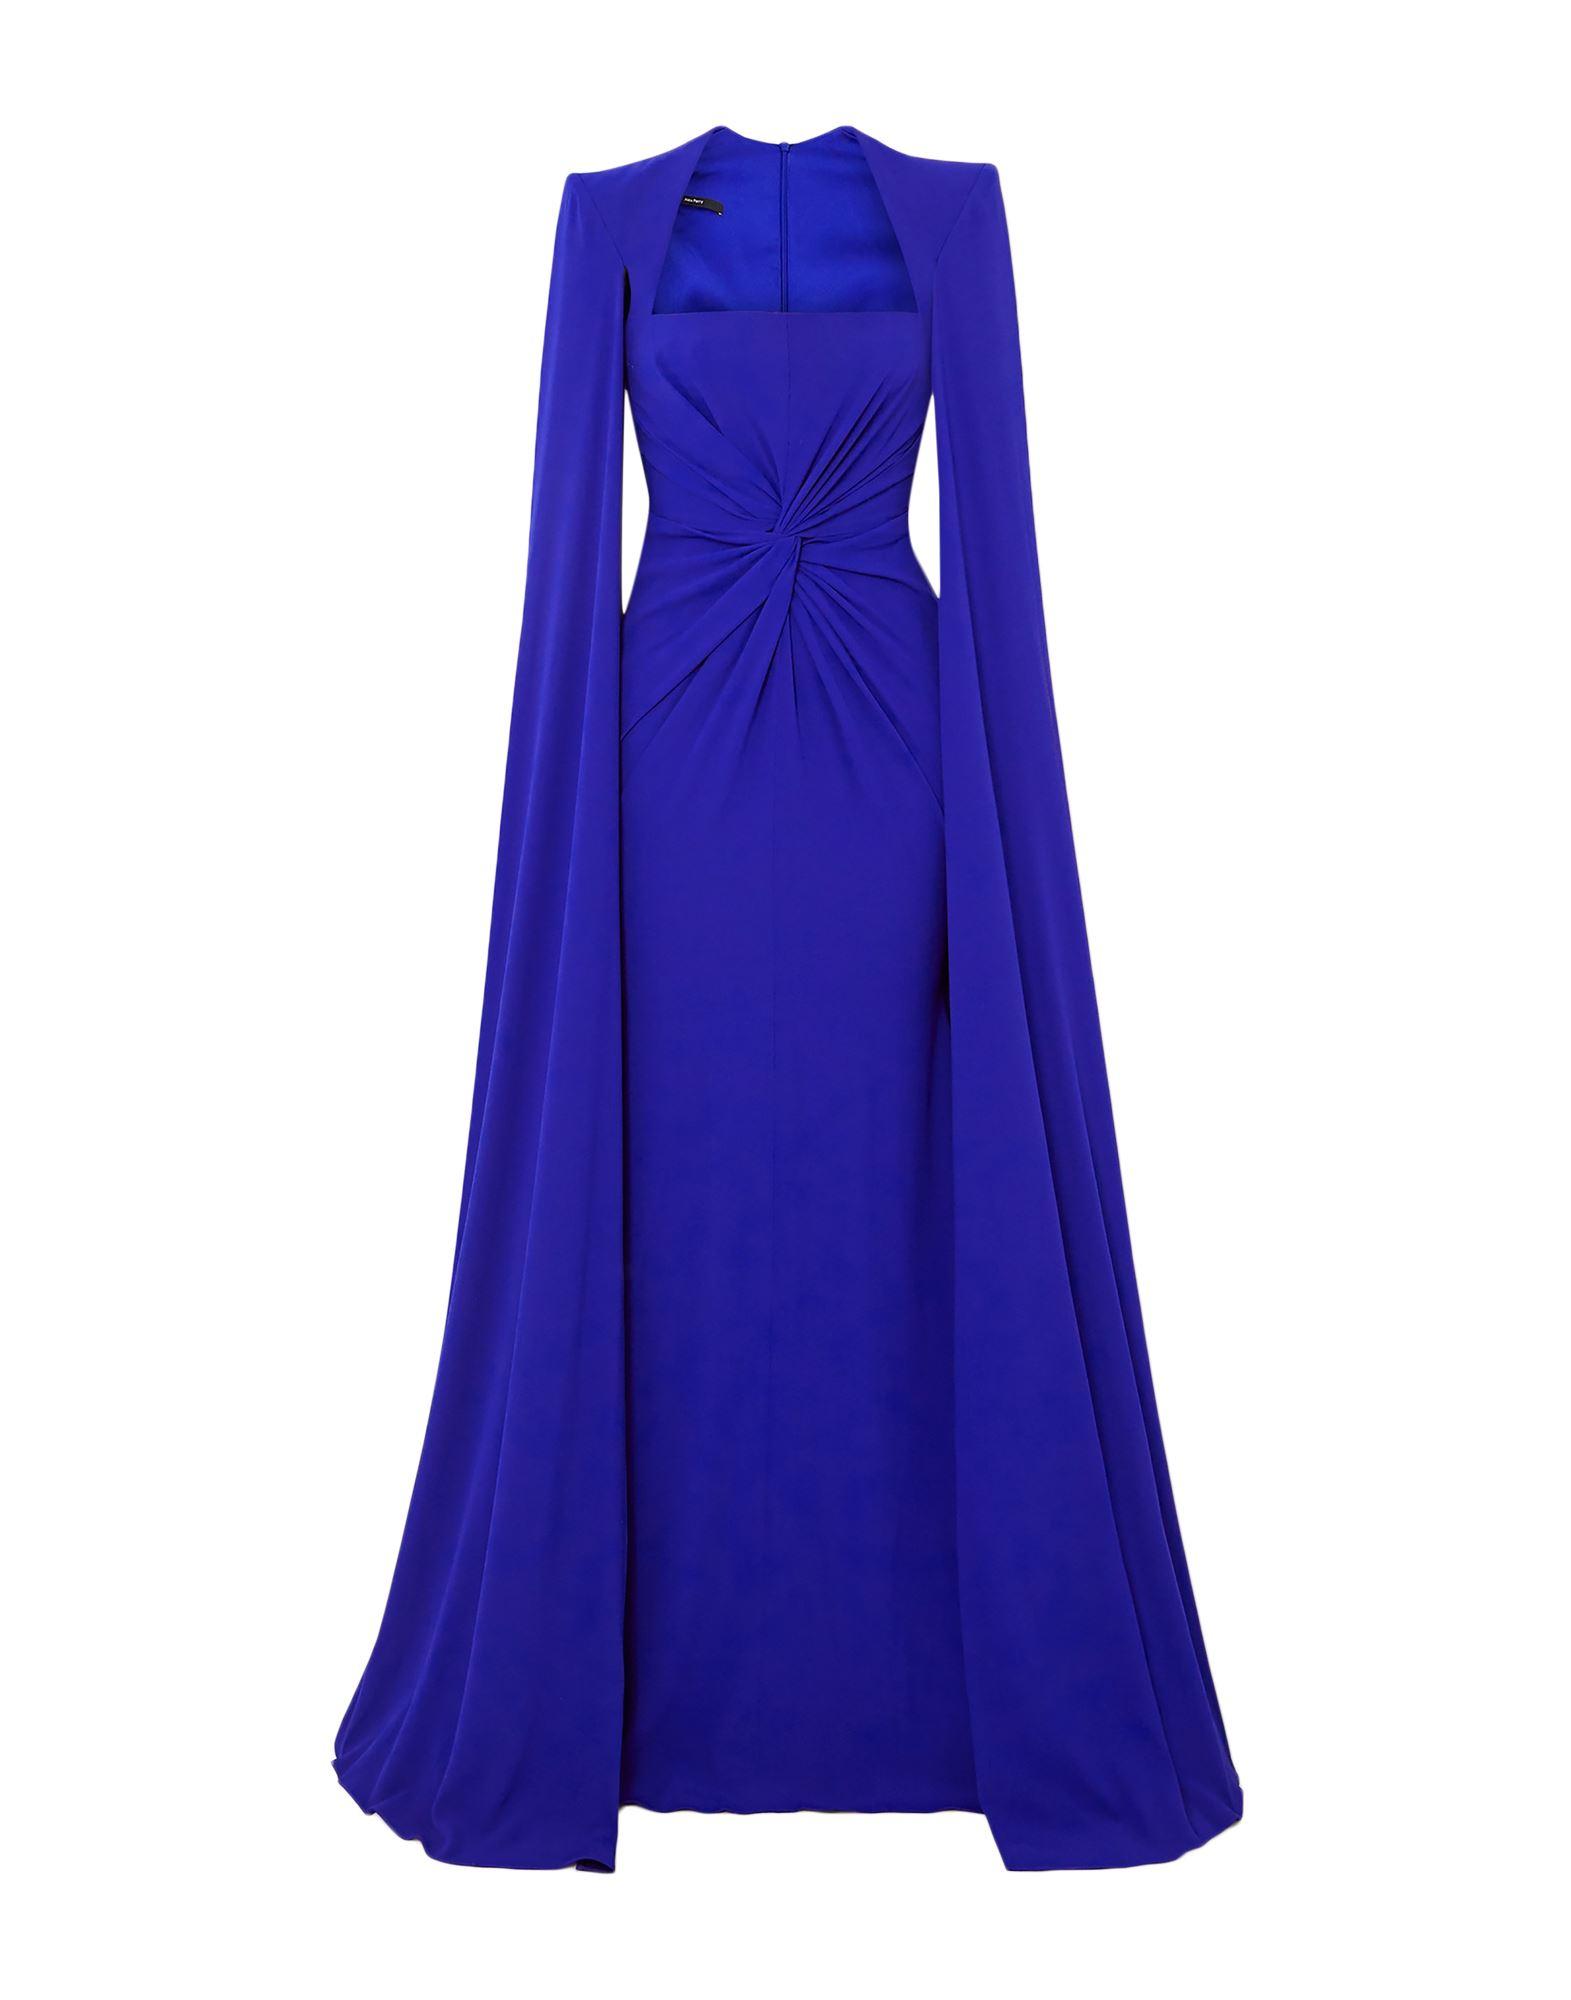 ALEX PERRY Длинное платье платье alex lu alex lu mp002xw01wc2